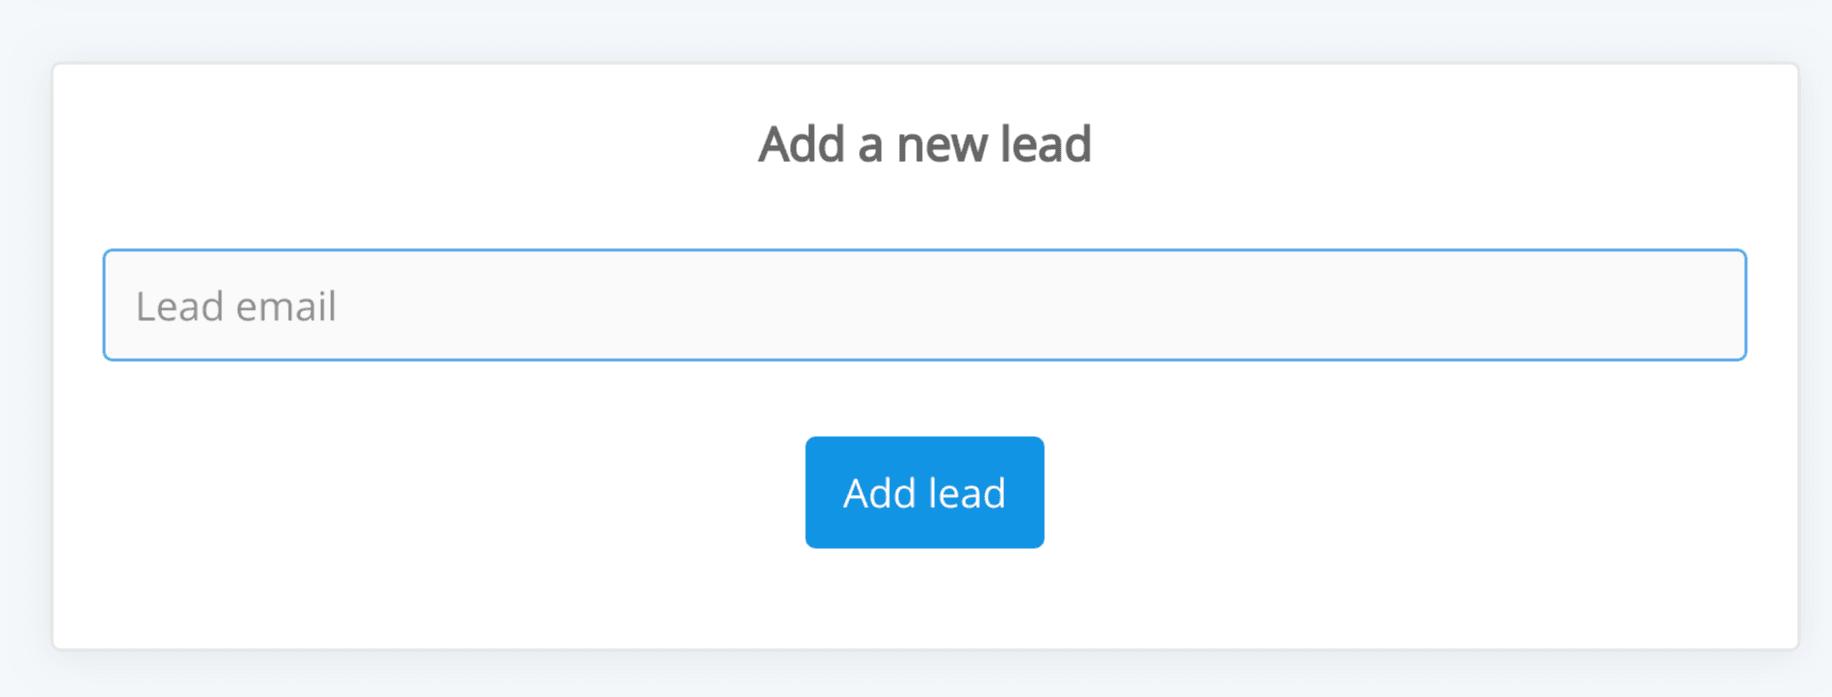 Add leads